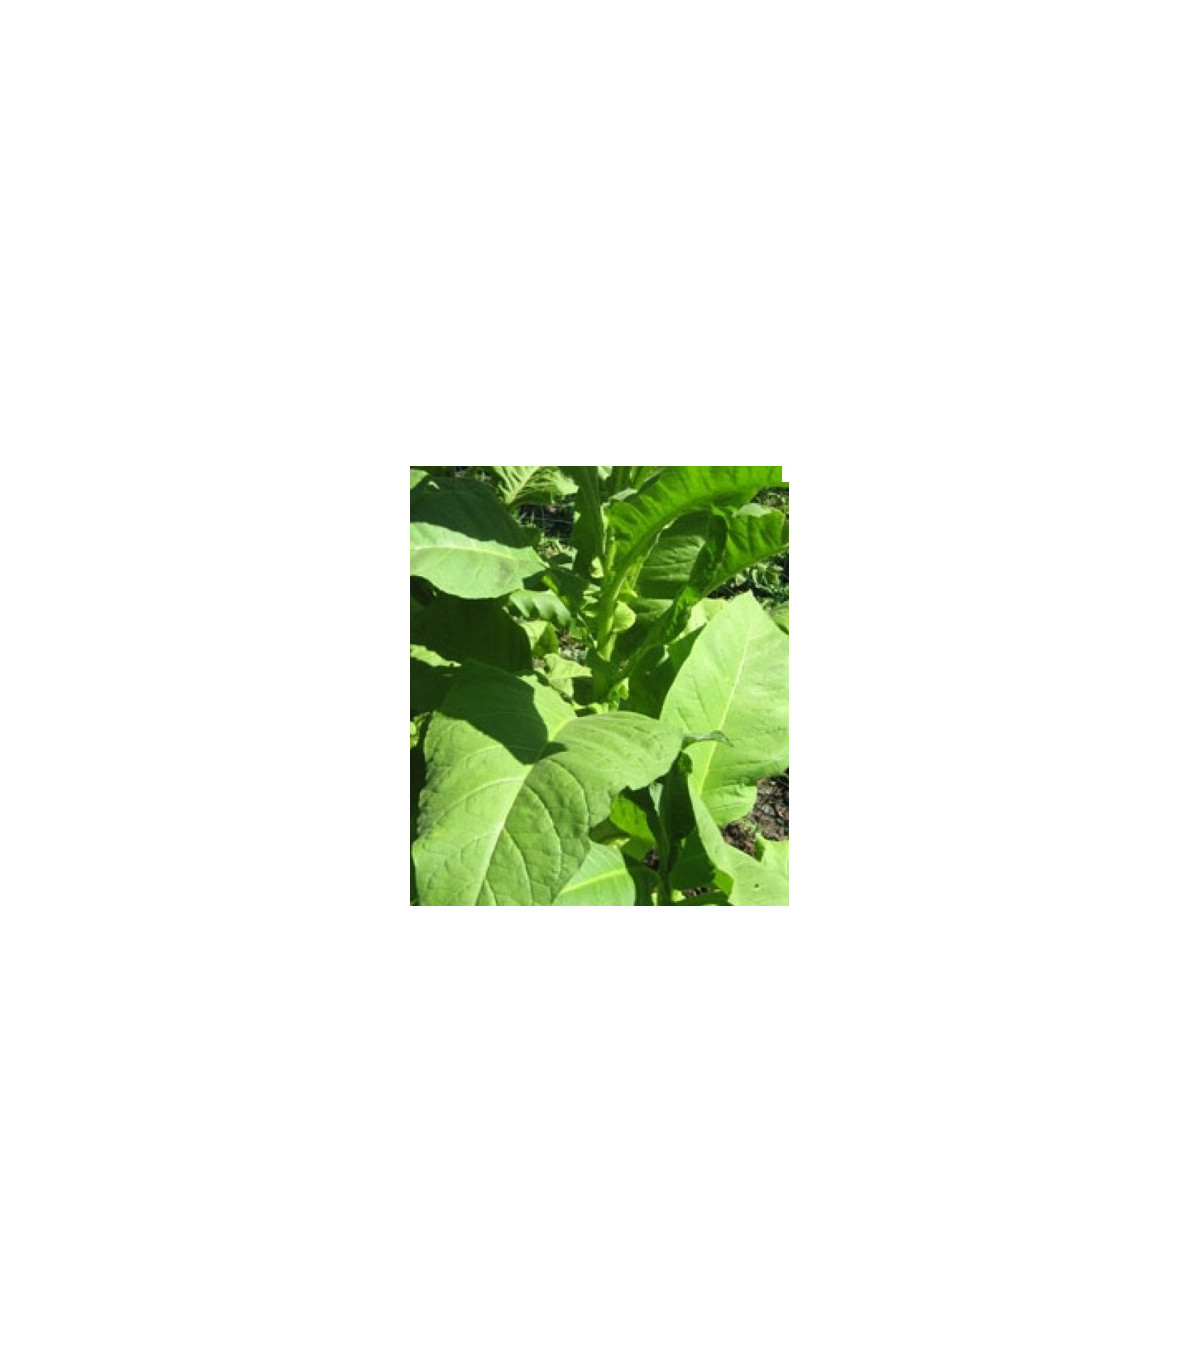 Tabak Green wood - Nicotiana tabacum - semená tabaku - 25 ks